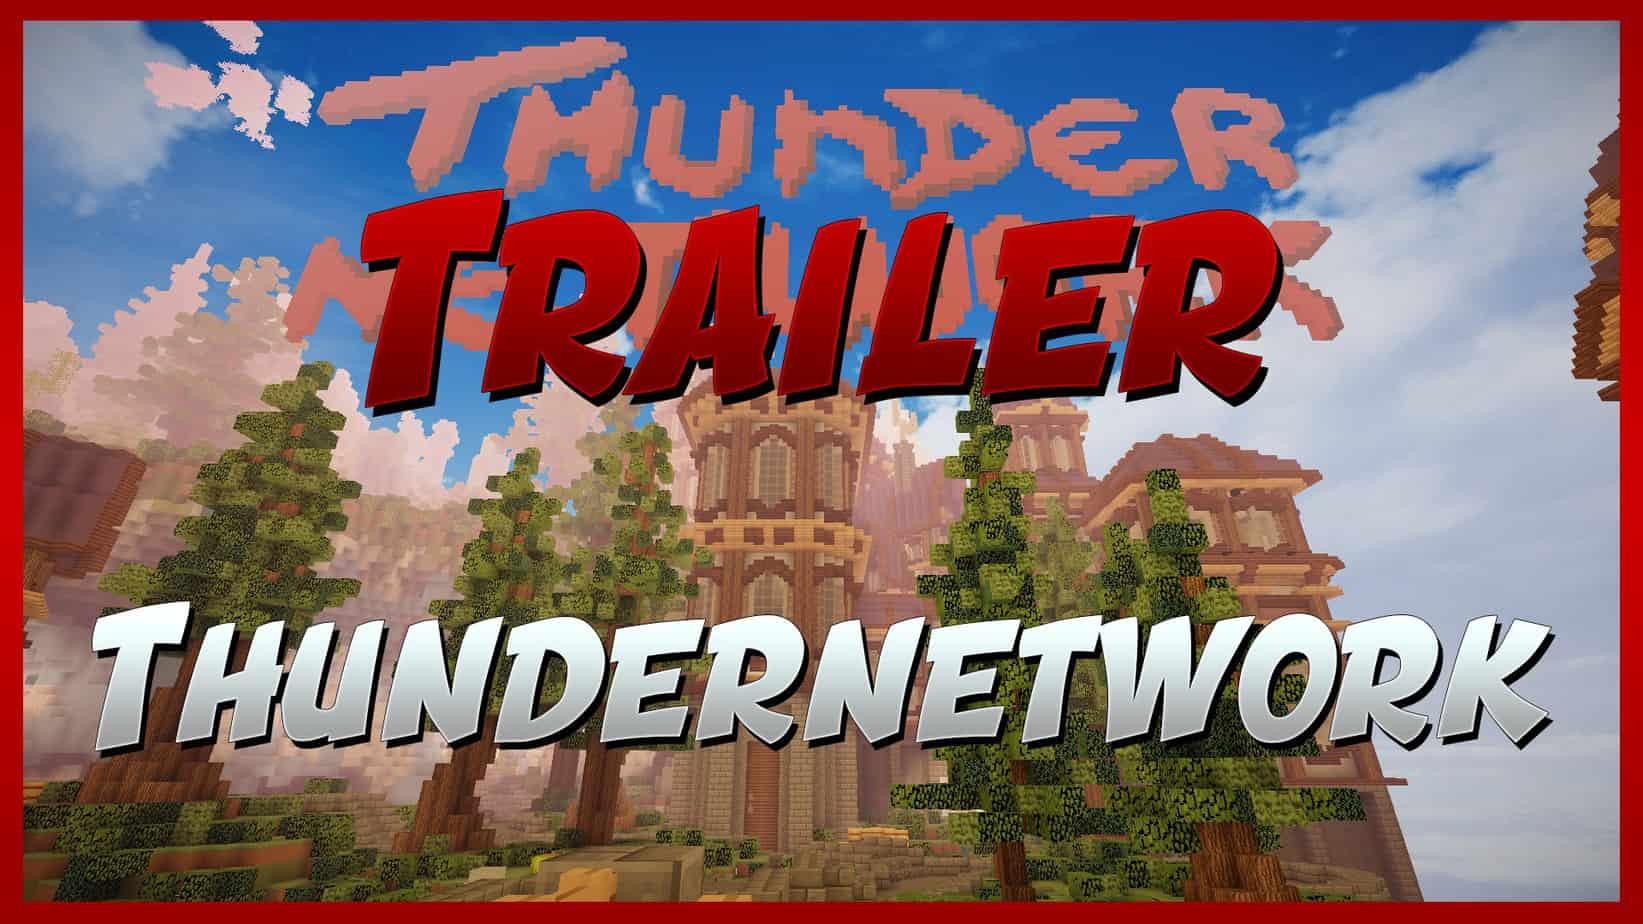 ThunderMiniature.jpg